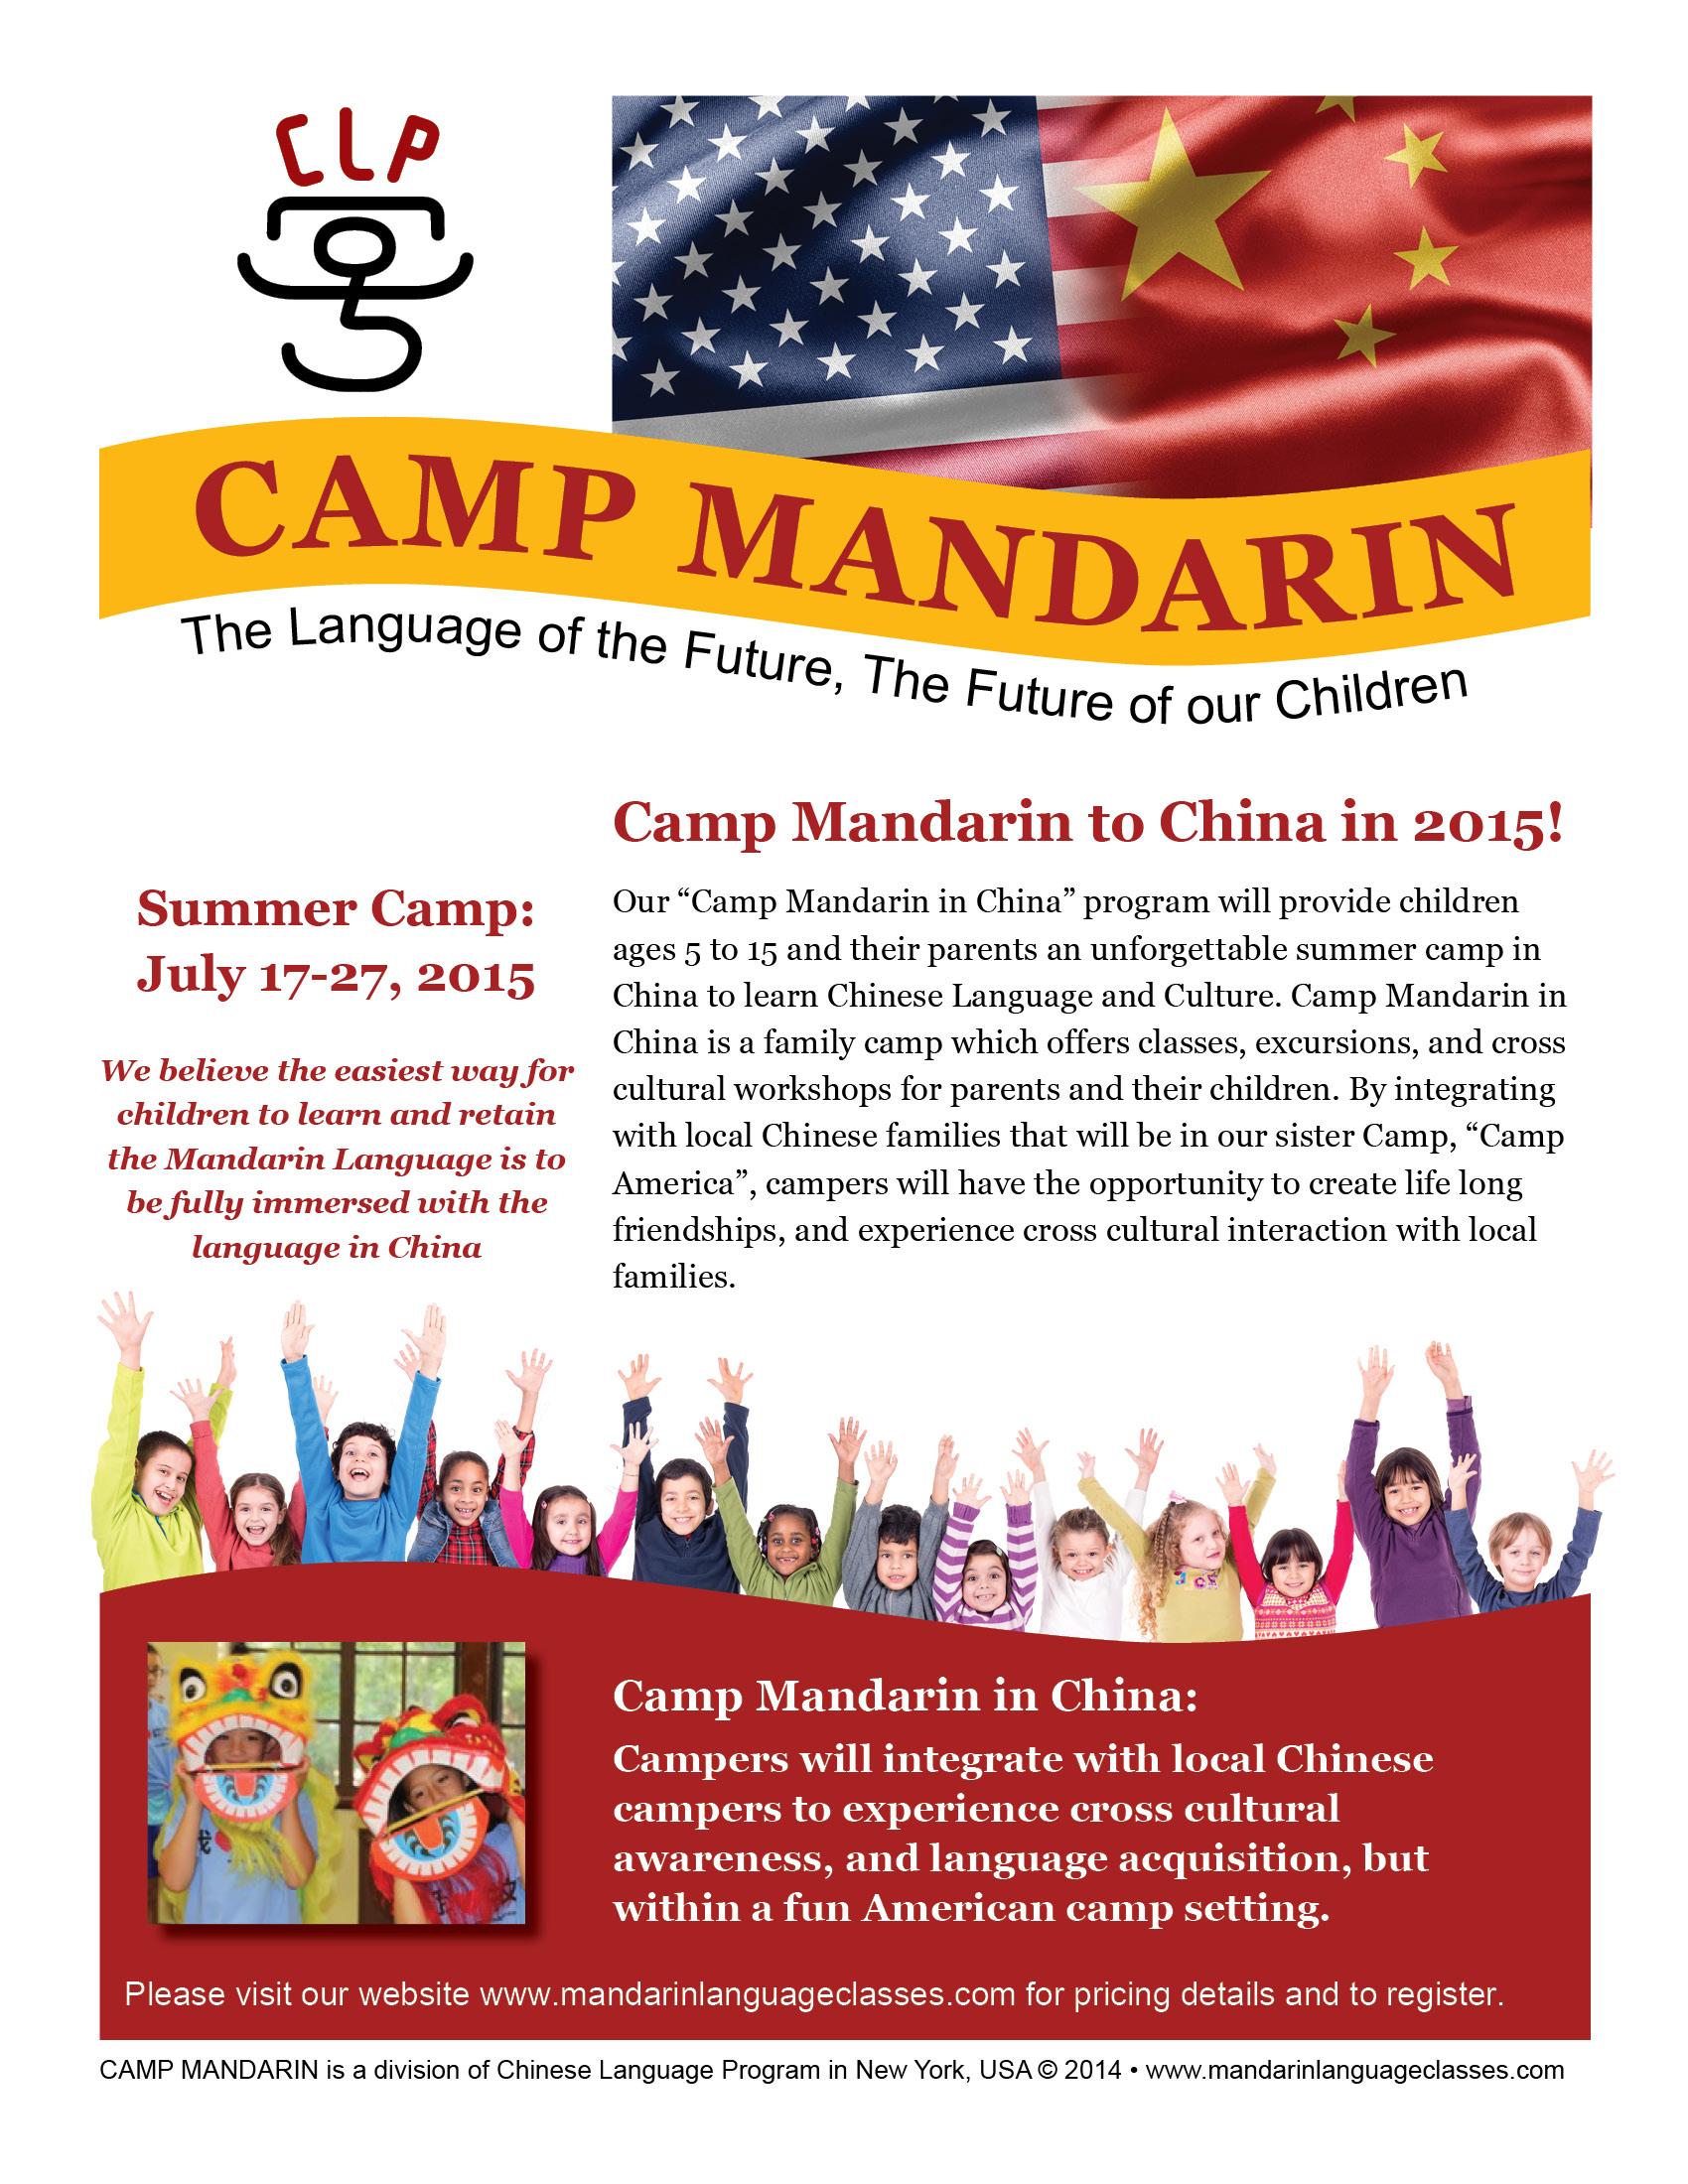 Camp Mandarin Goes to China